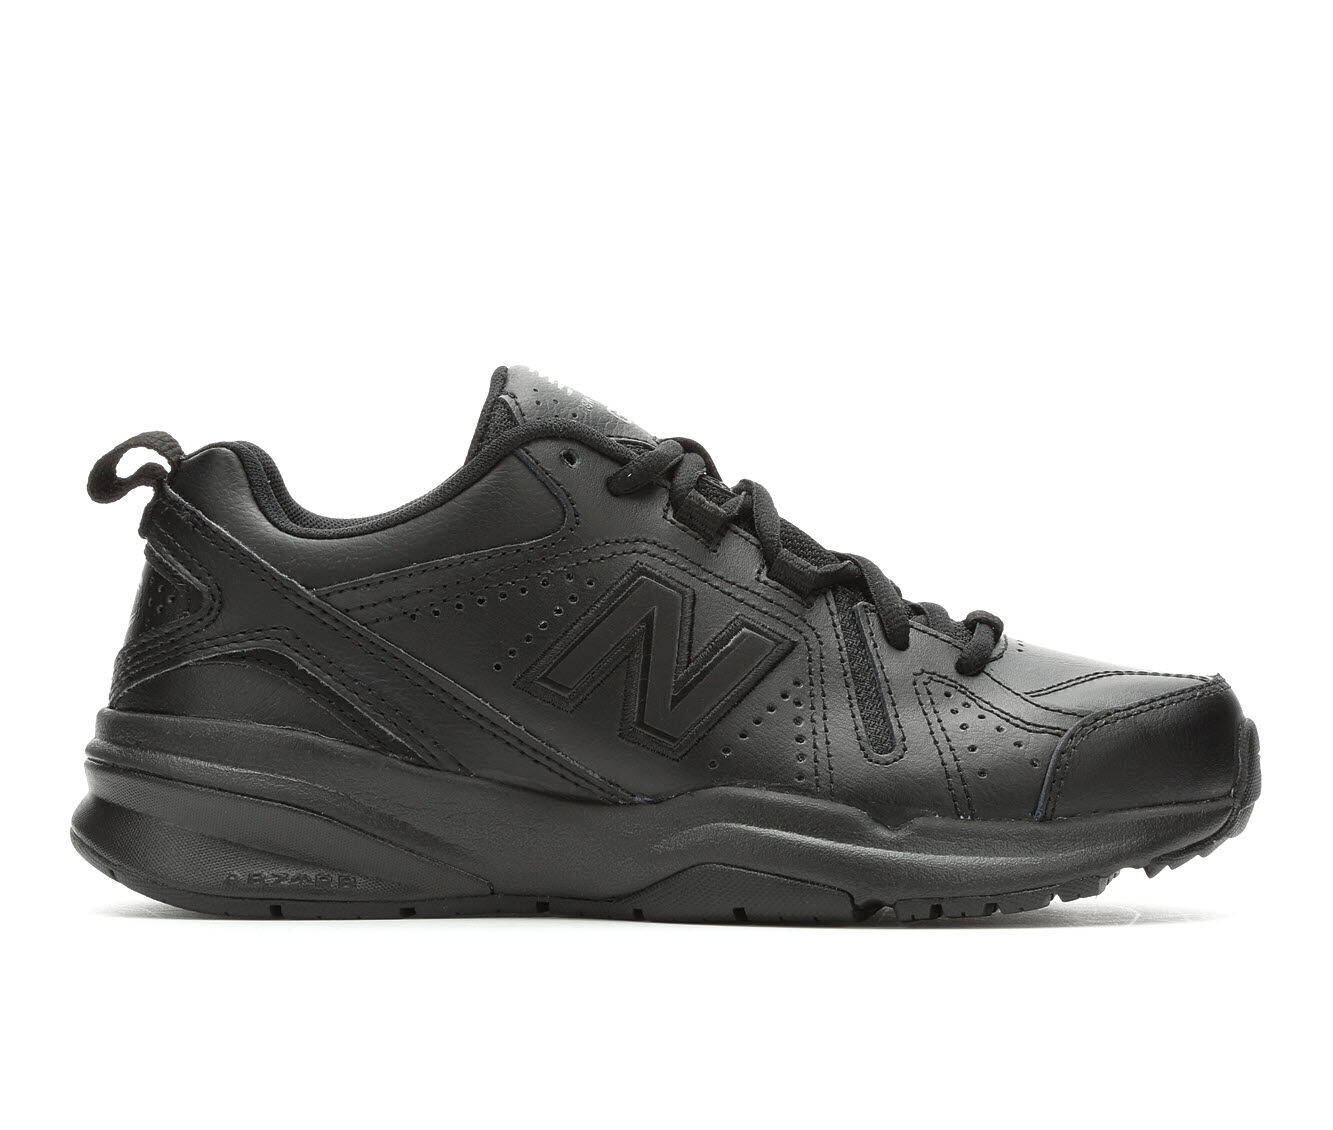 Women's New Balance WX608V5 Training Shoes Black/Black